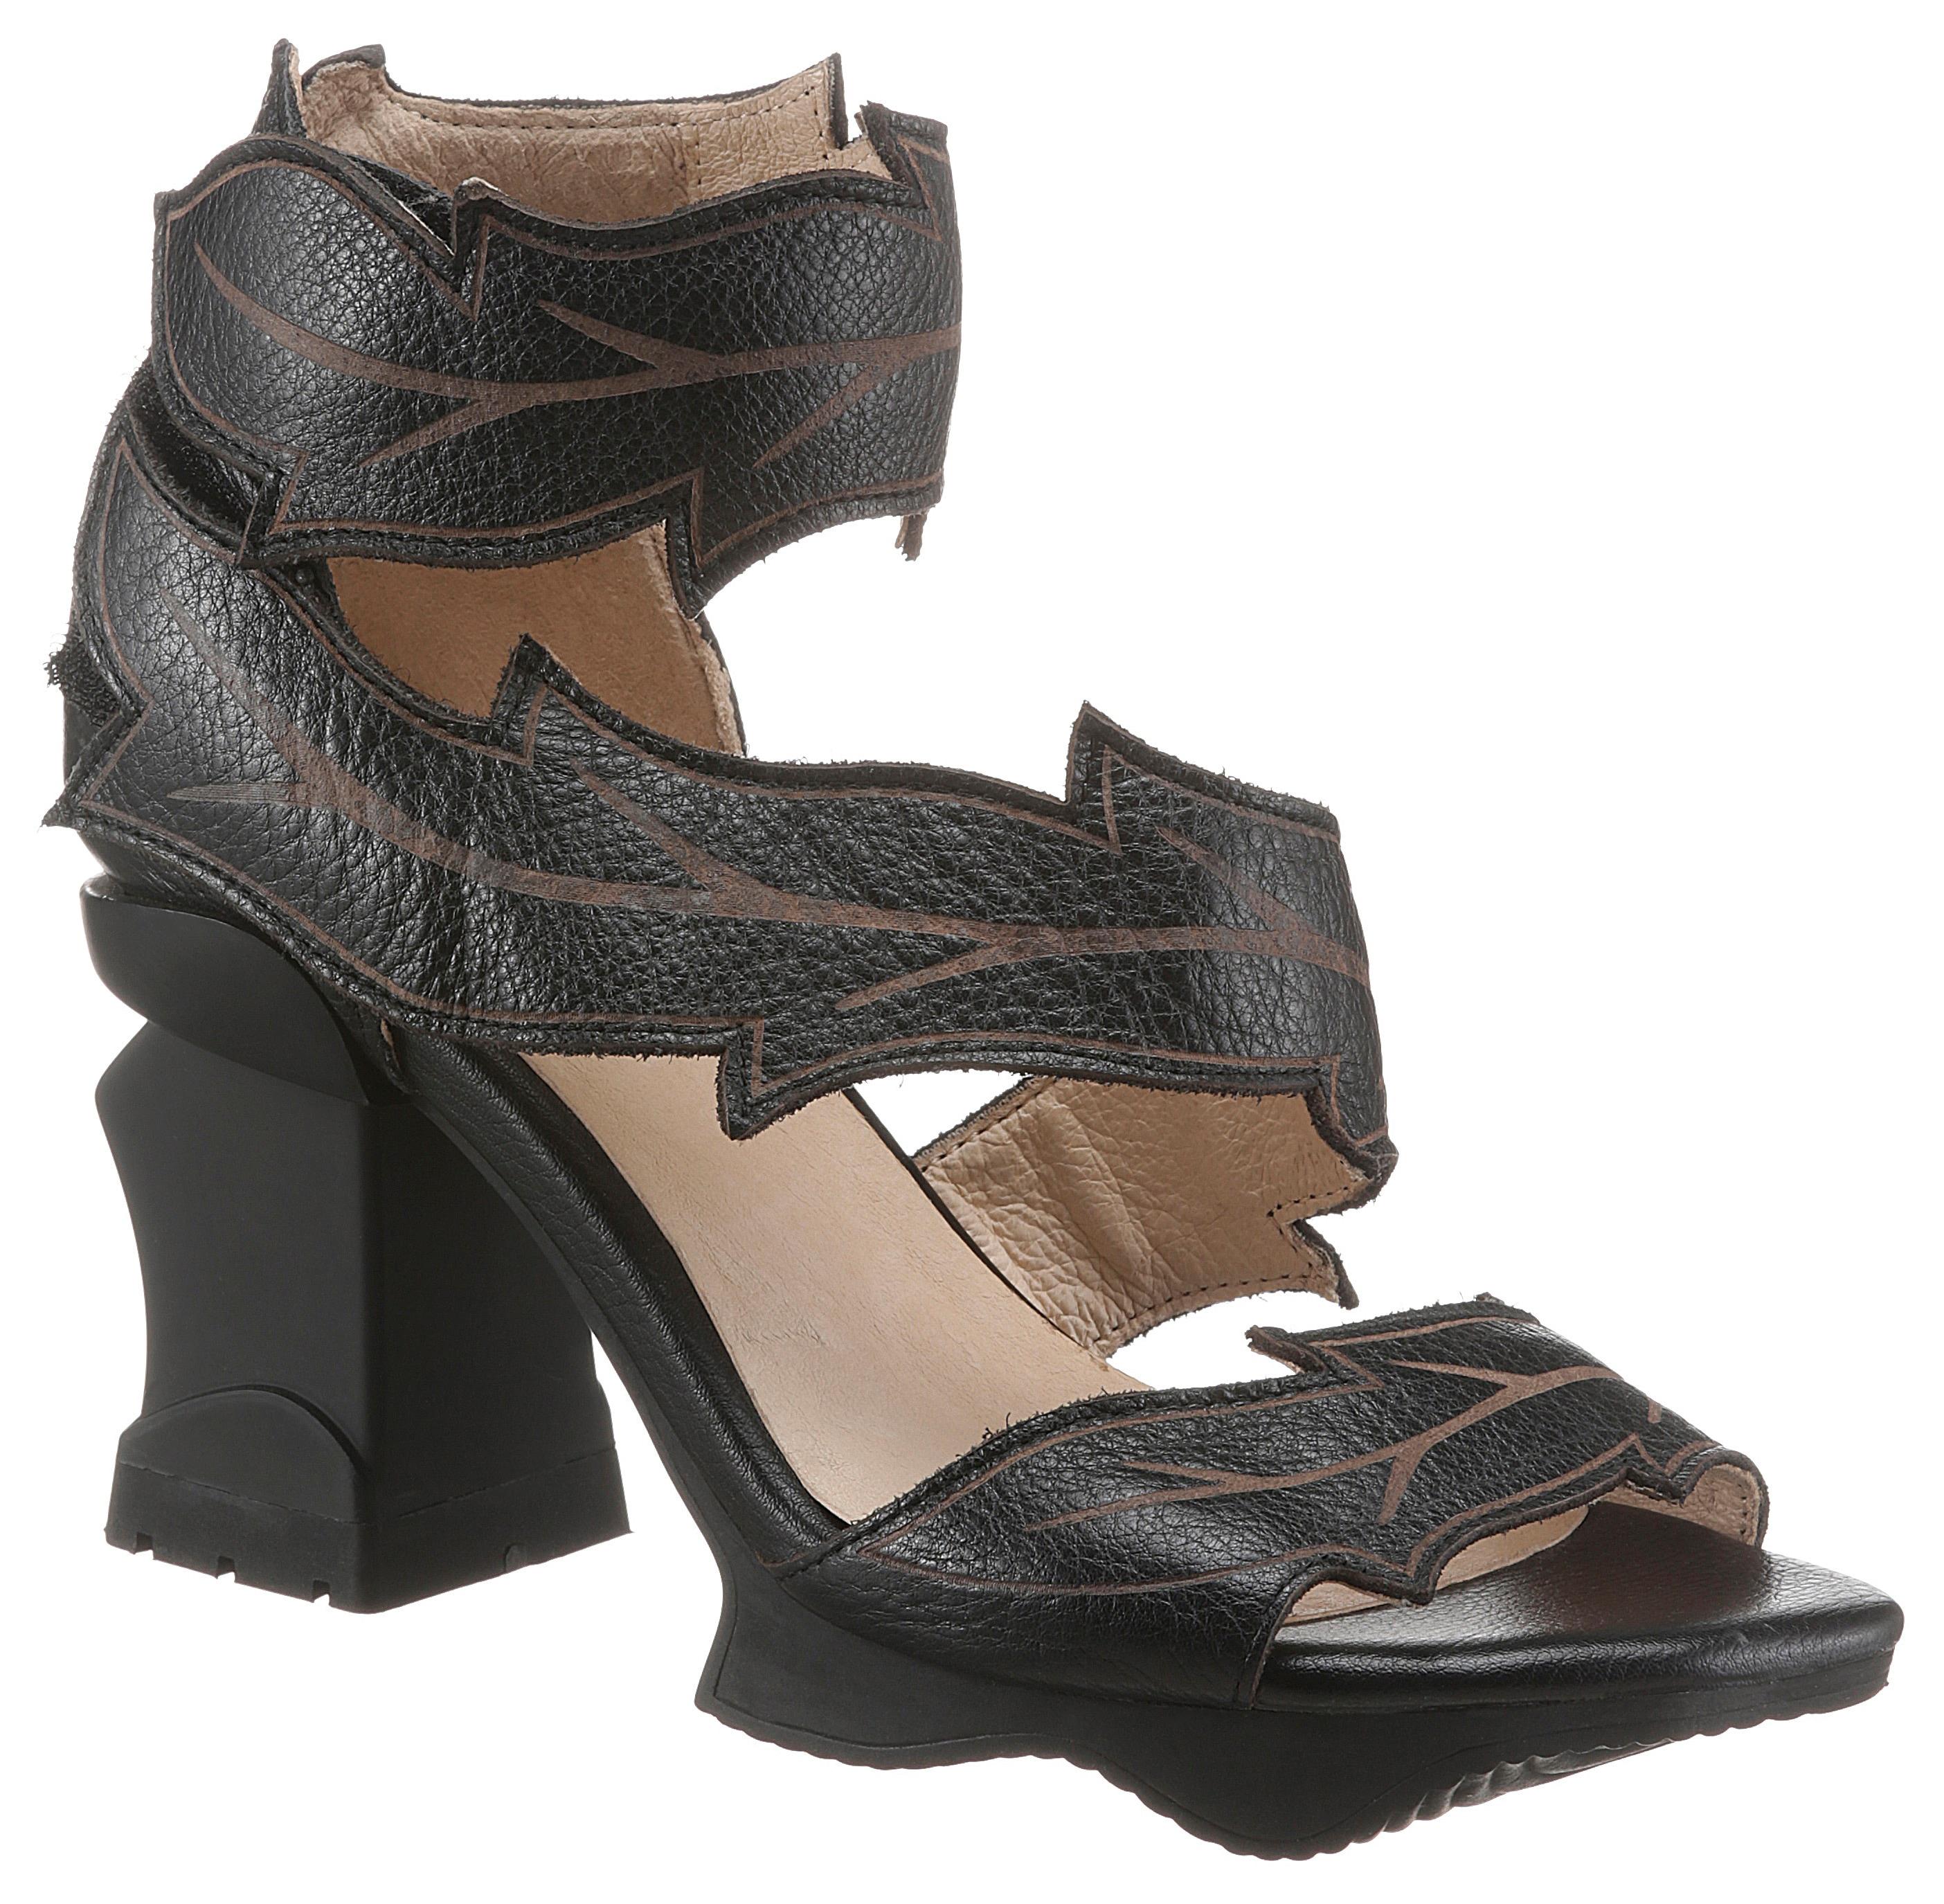 laura vita -  Sandalette ARCMANCEO, im extravaganten Look